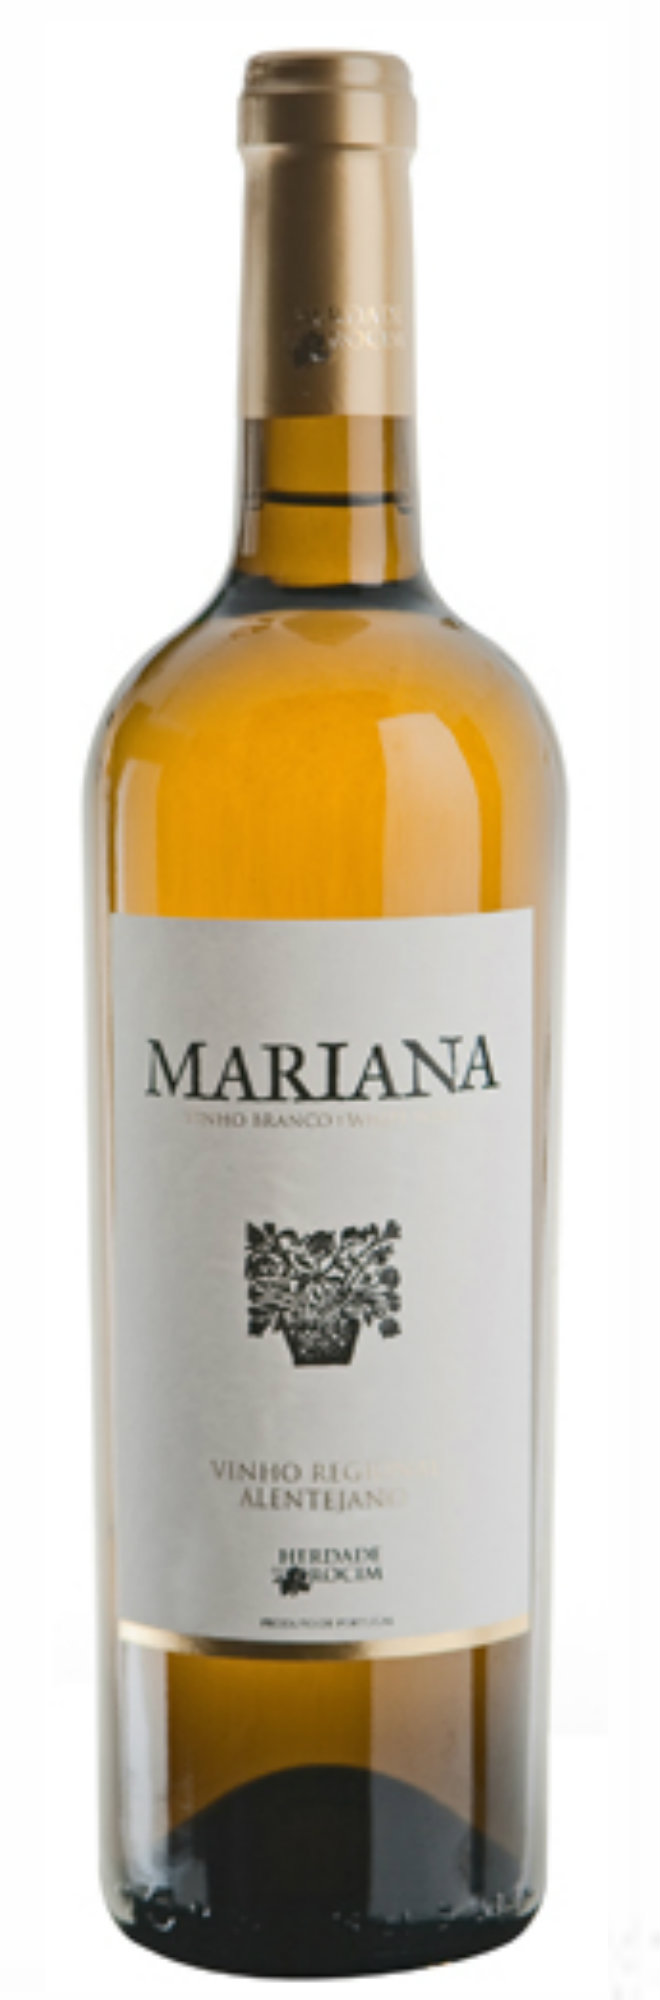 Herdade do Rocim Mariana Branco